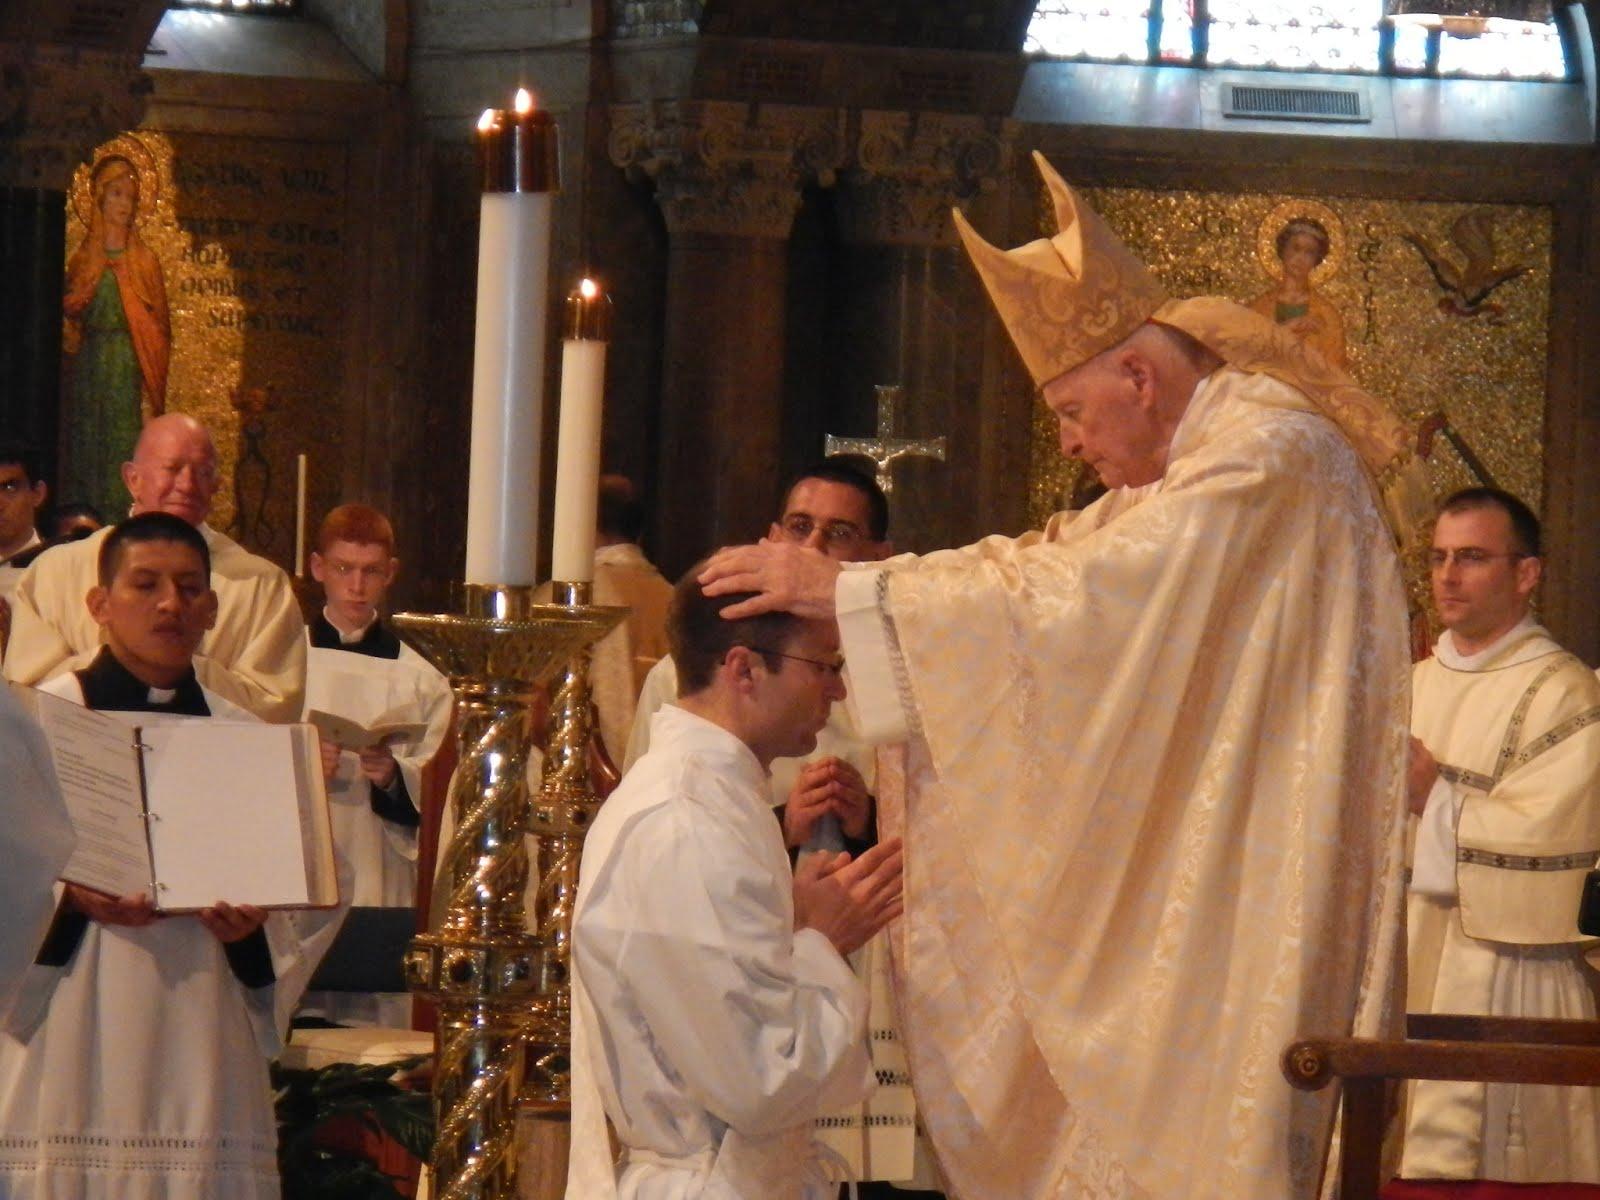 Padre buela homosexual marriage